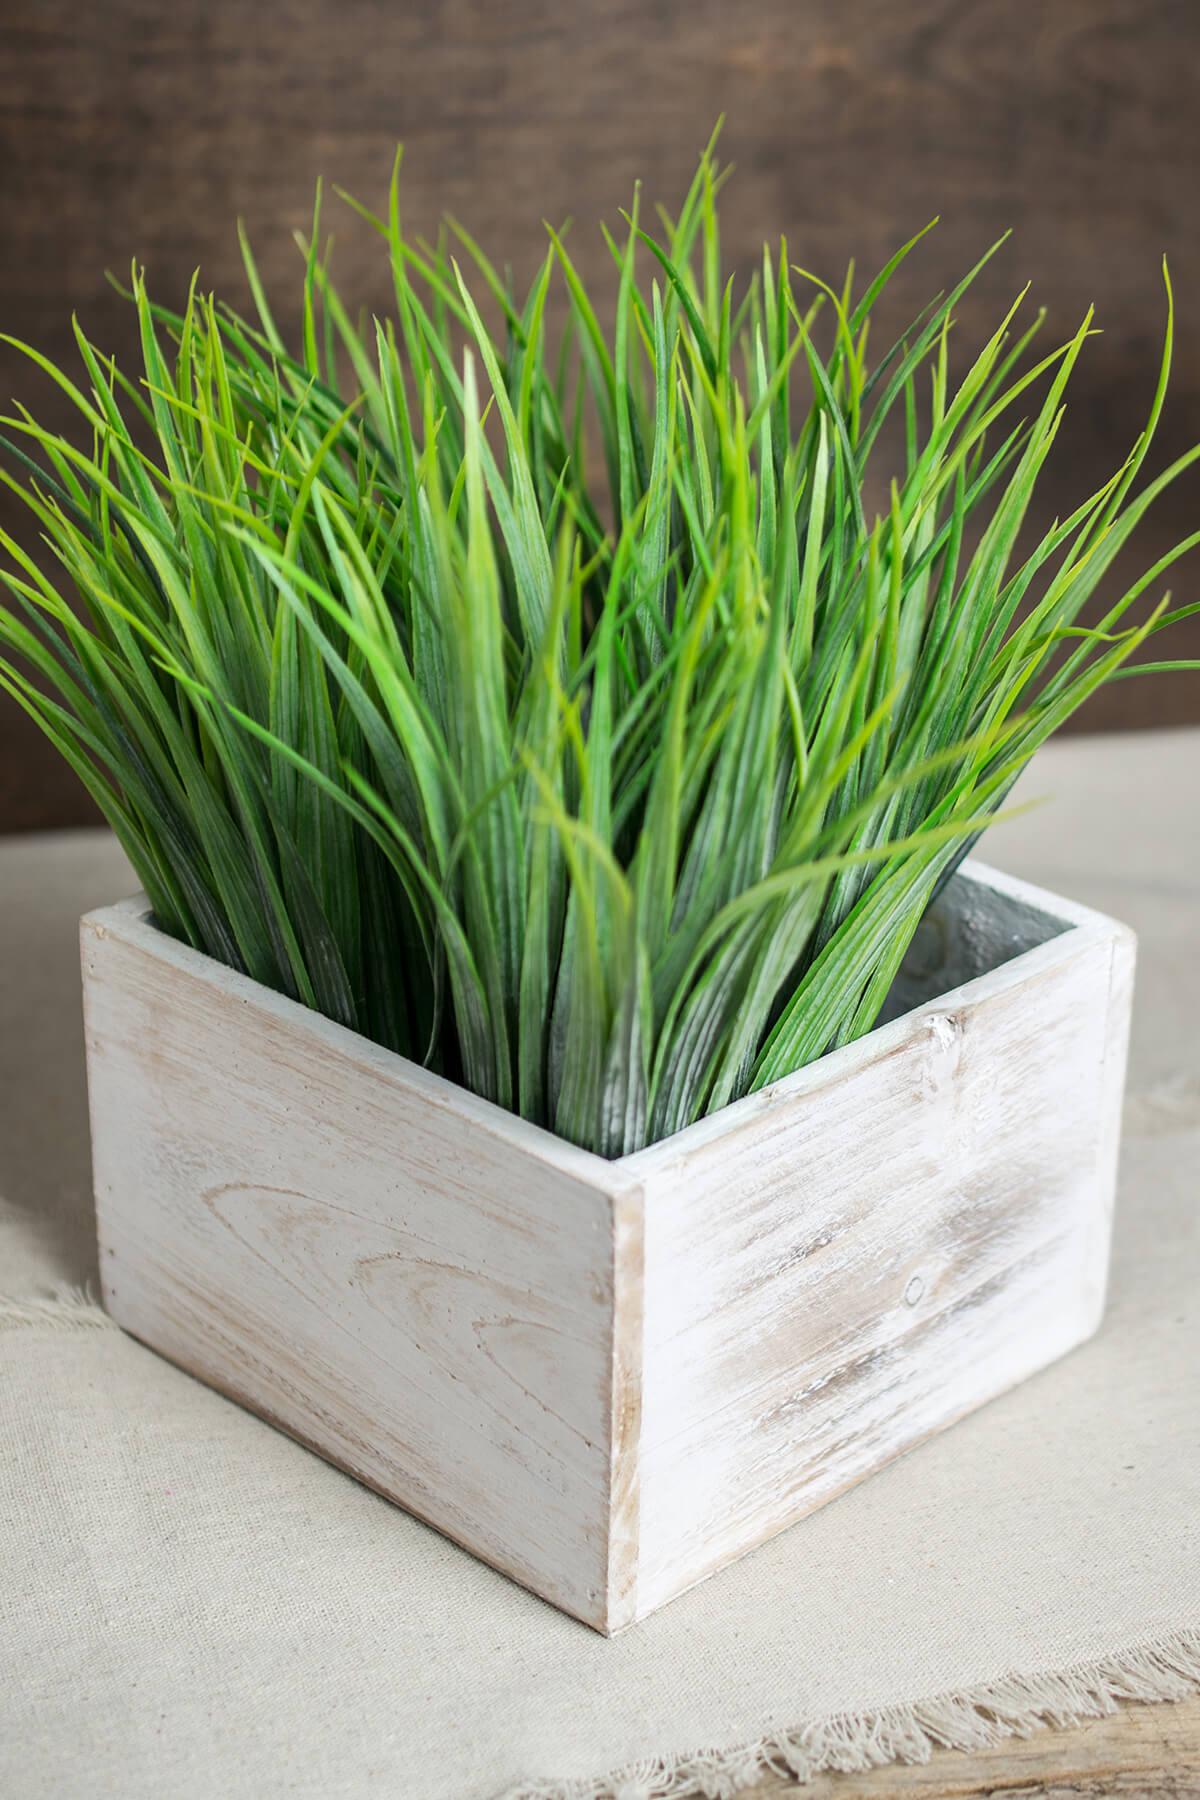 fir l box planter w design garden wooden gh wood or small sweet outdoor nifty boxes ideas robust house regaling x hexagon